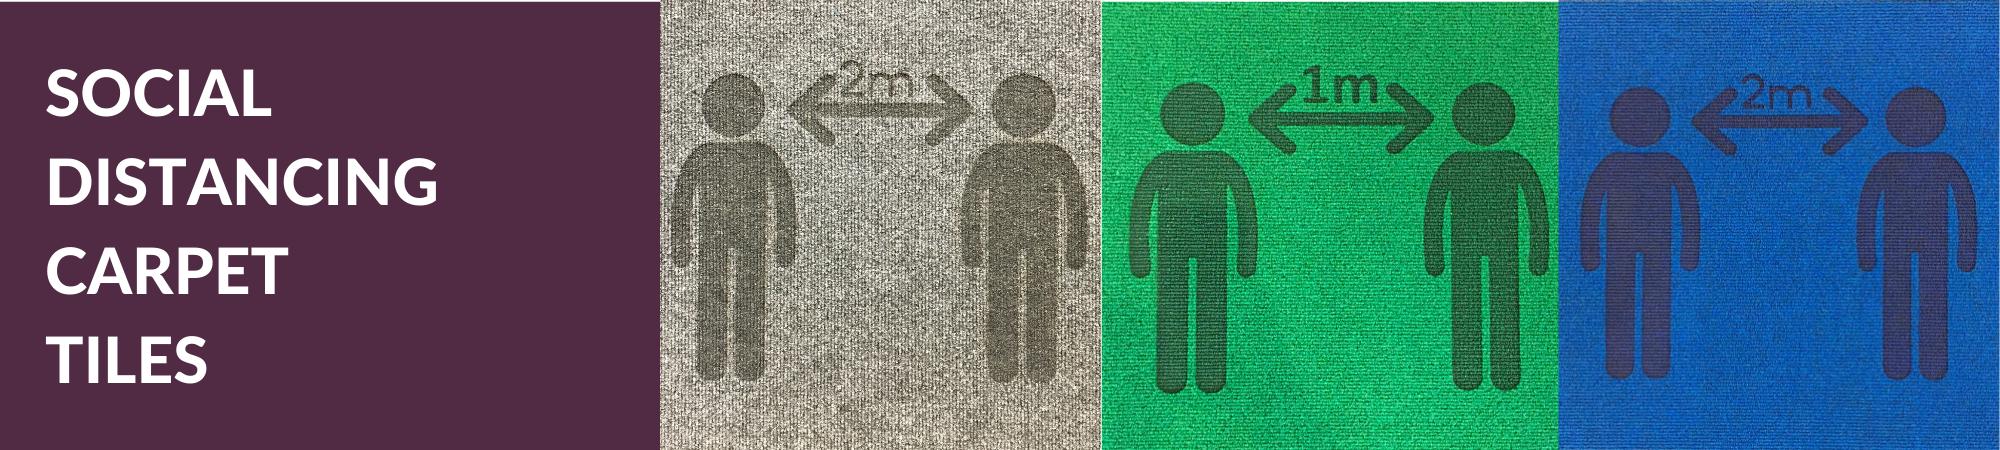 Heckmondwike | Social Distancing Range | Supacord Tile | Banner